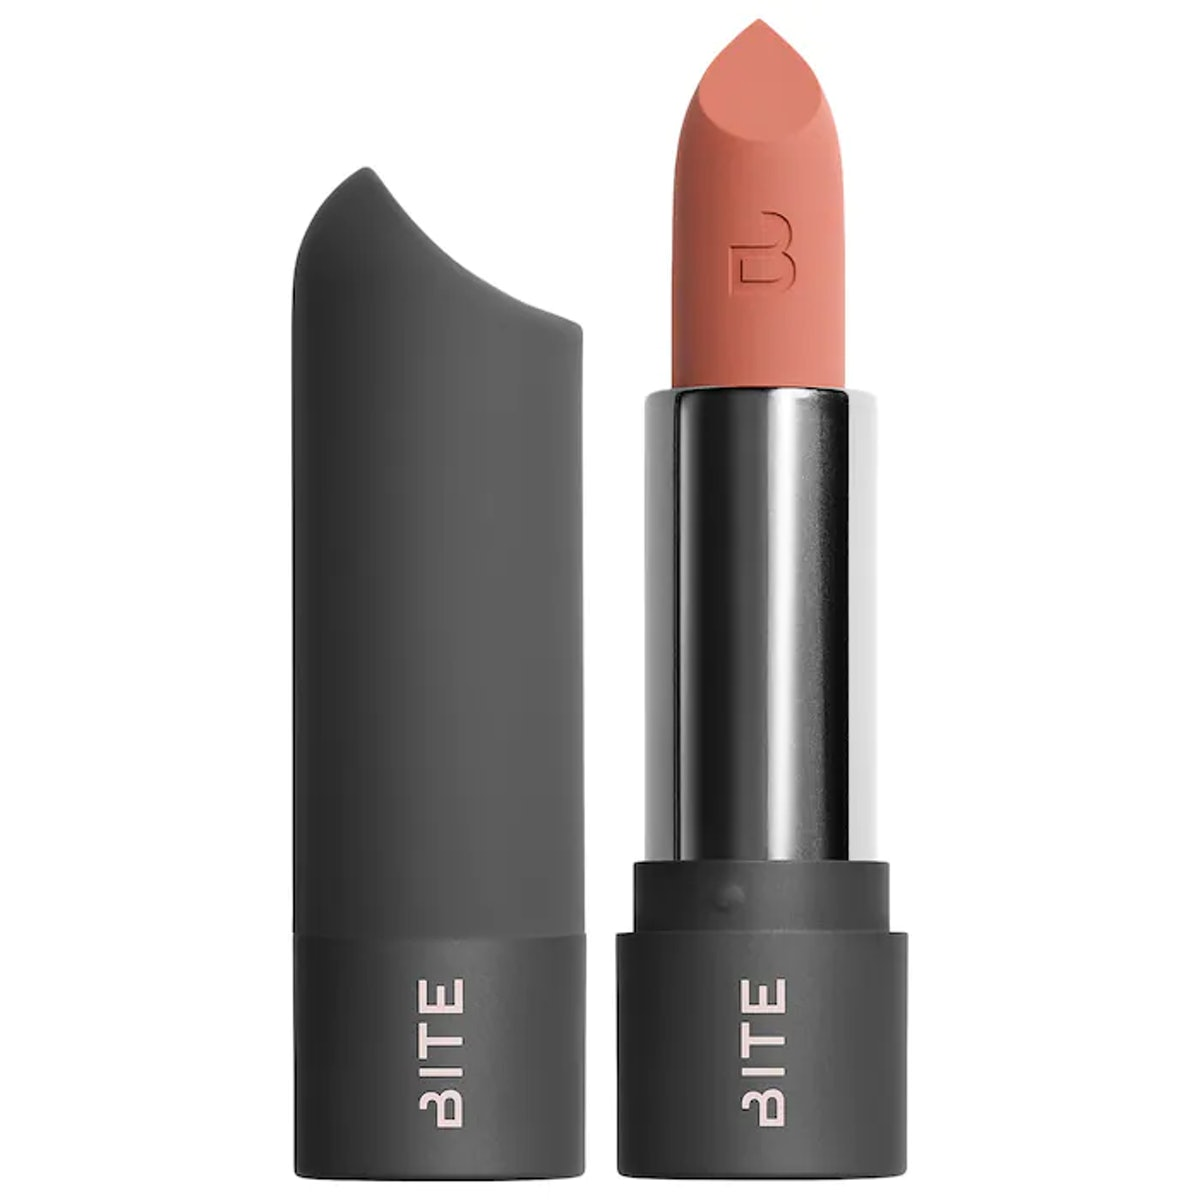 BITE Beauty Power Move Hydrating Soft Matte Lipstick in Tamarind